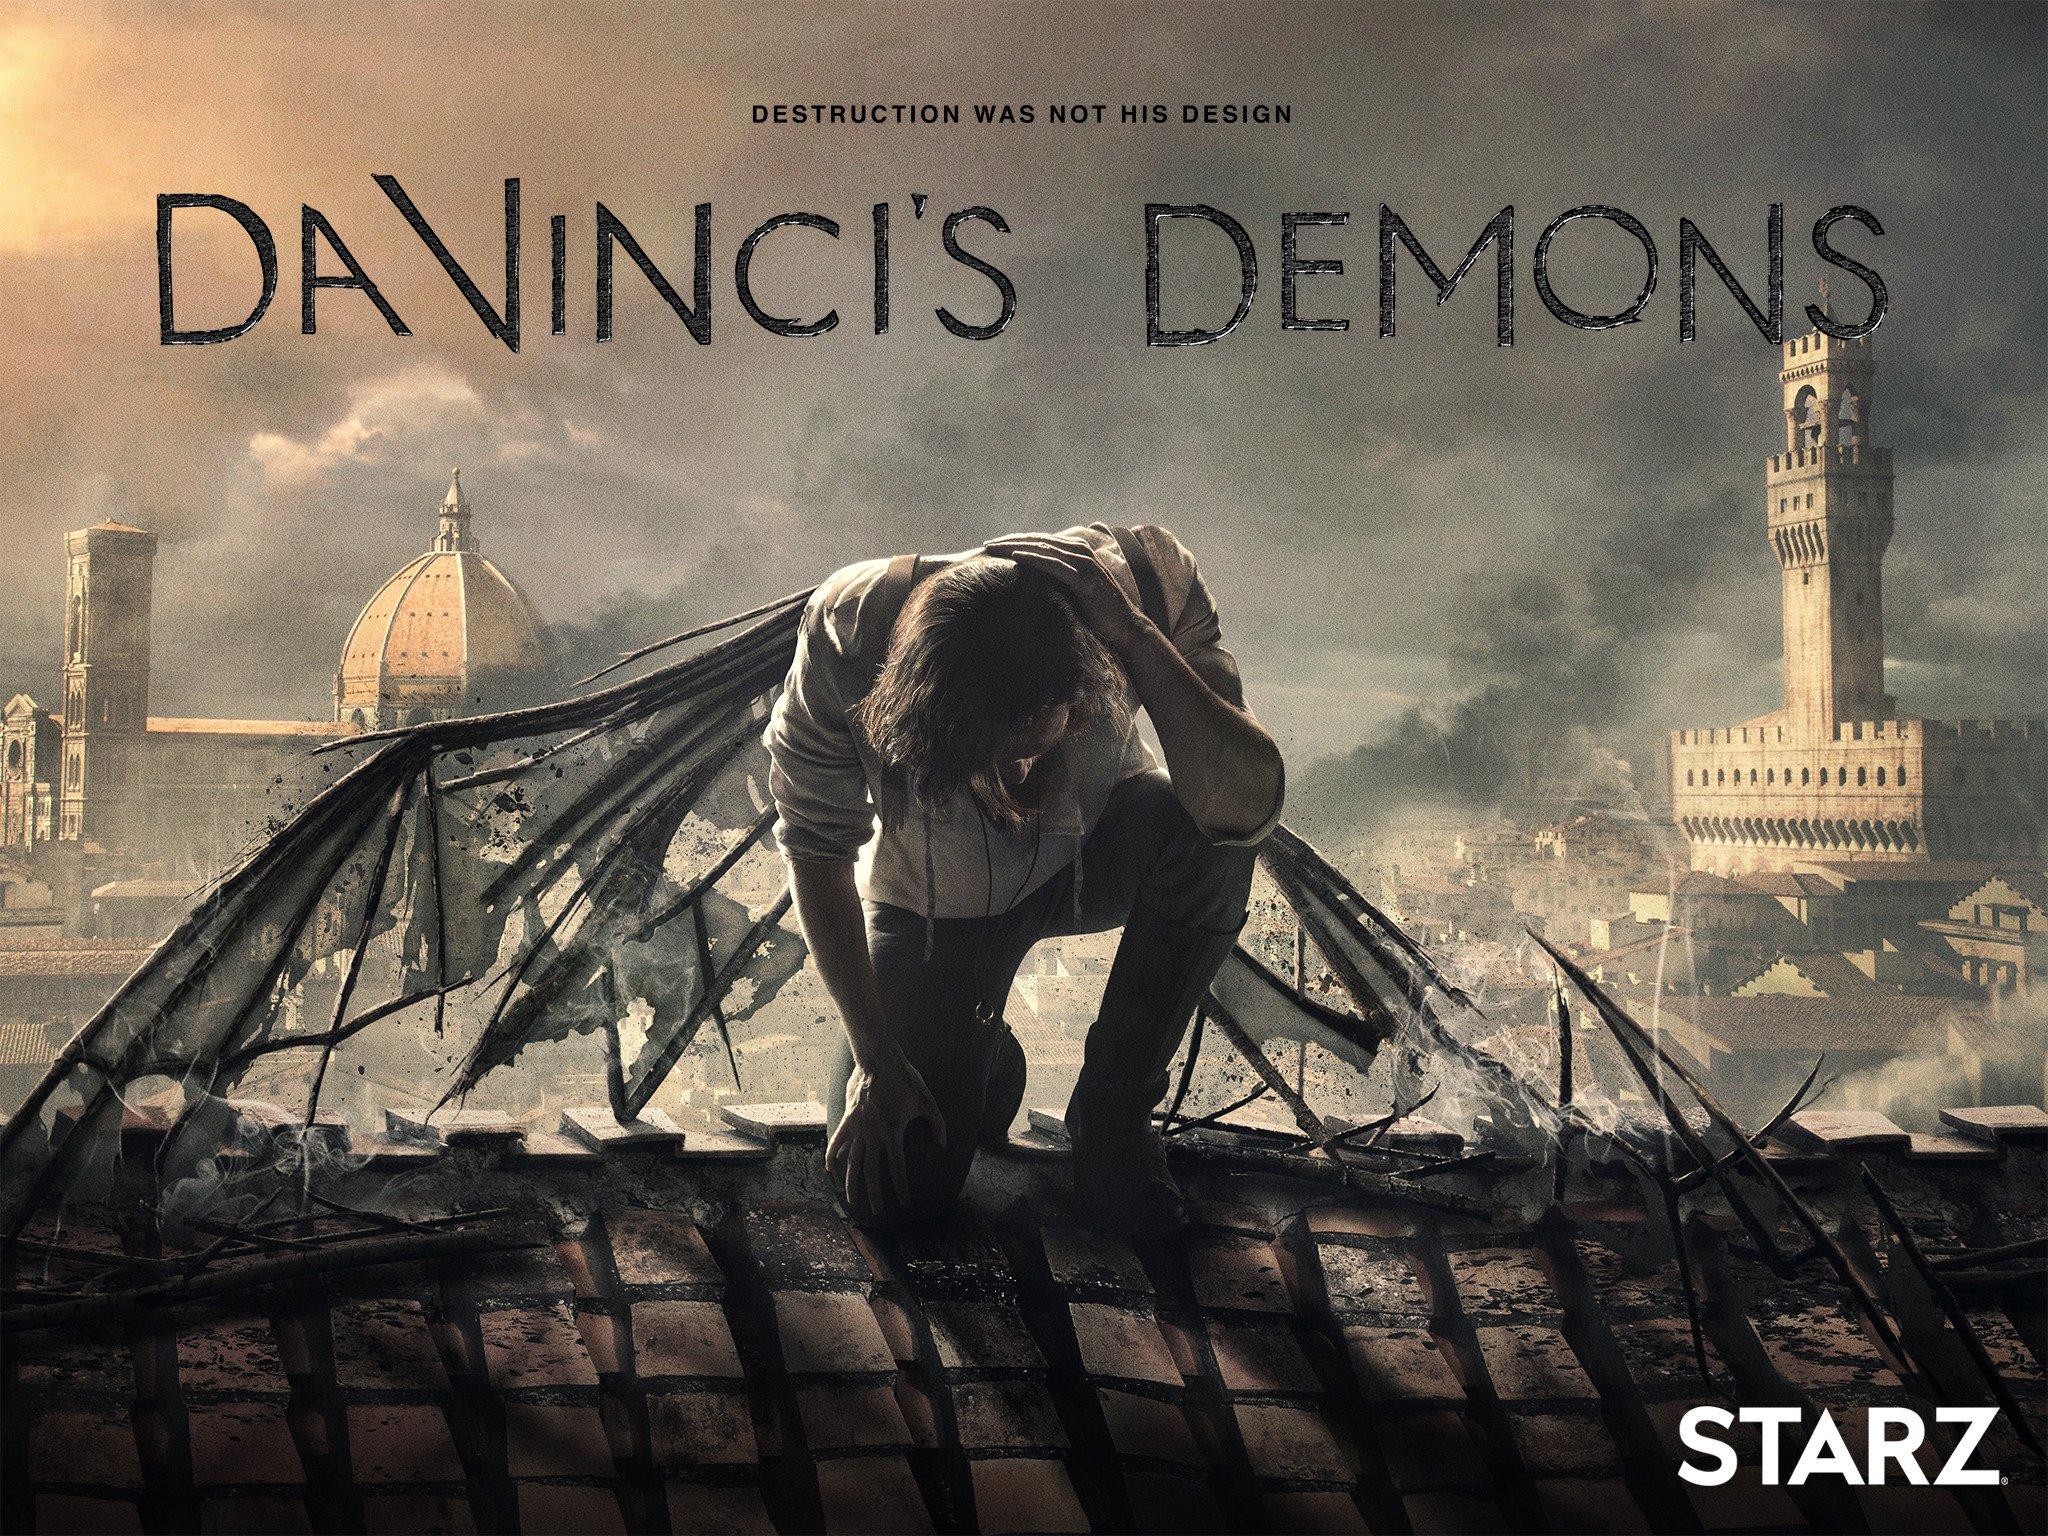 da vincis demons season 3 free streaming